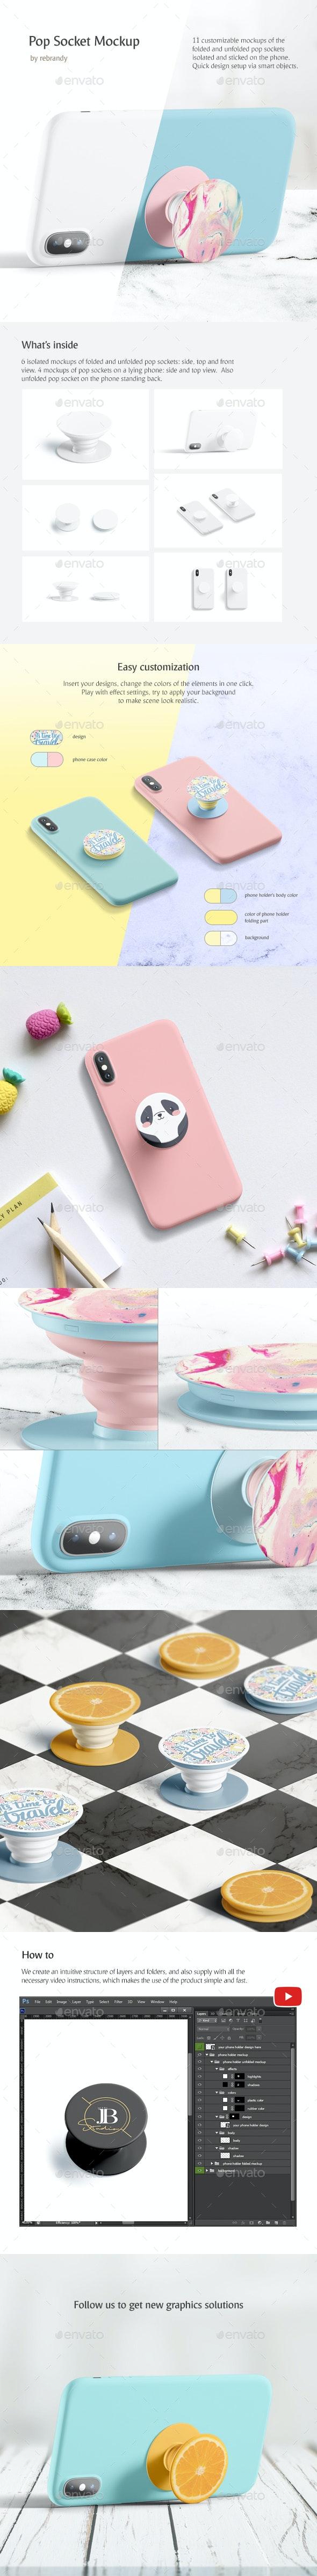 Pop Socket Mockup - Product Mock-Ups Graphics